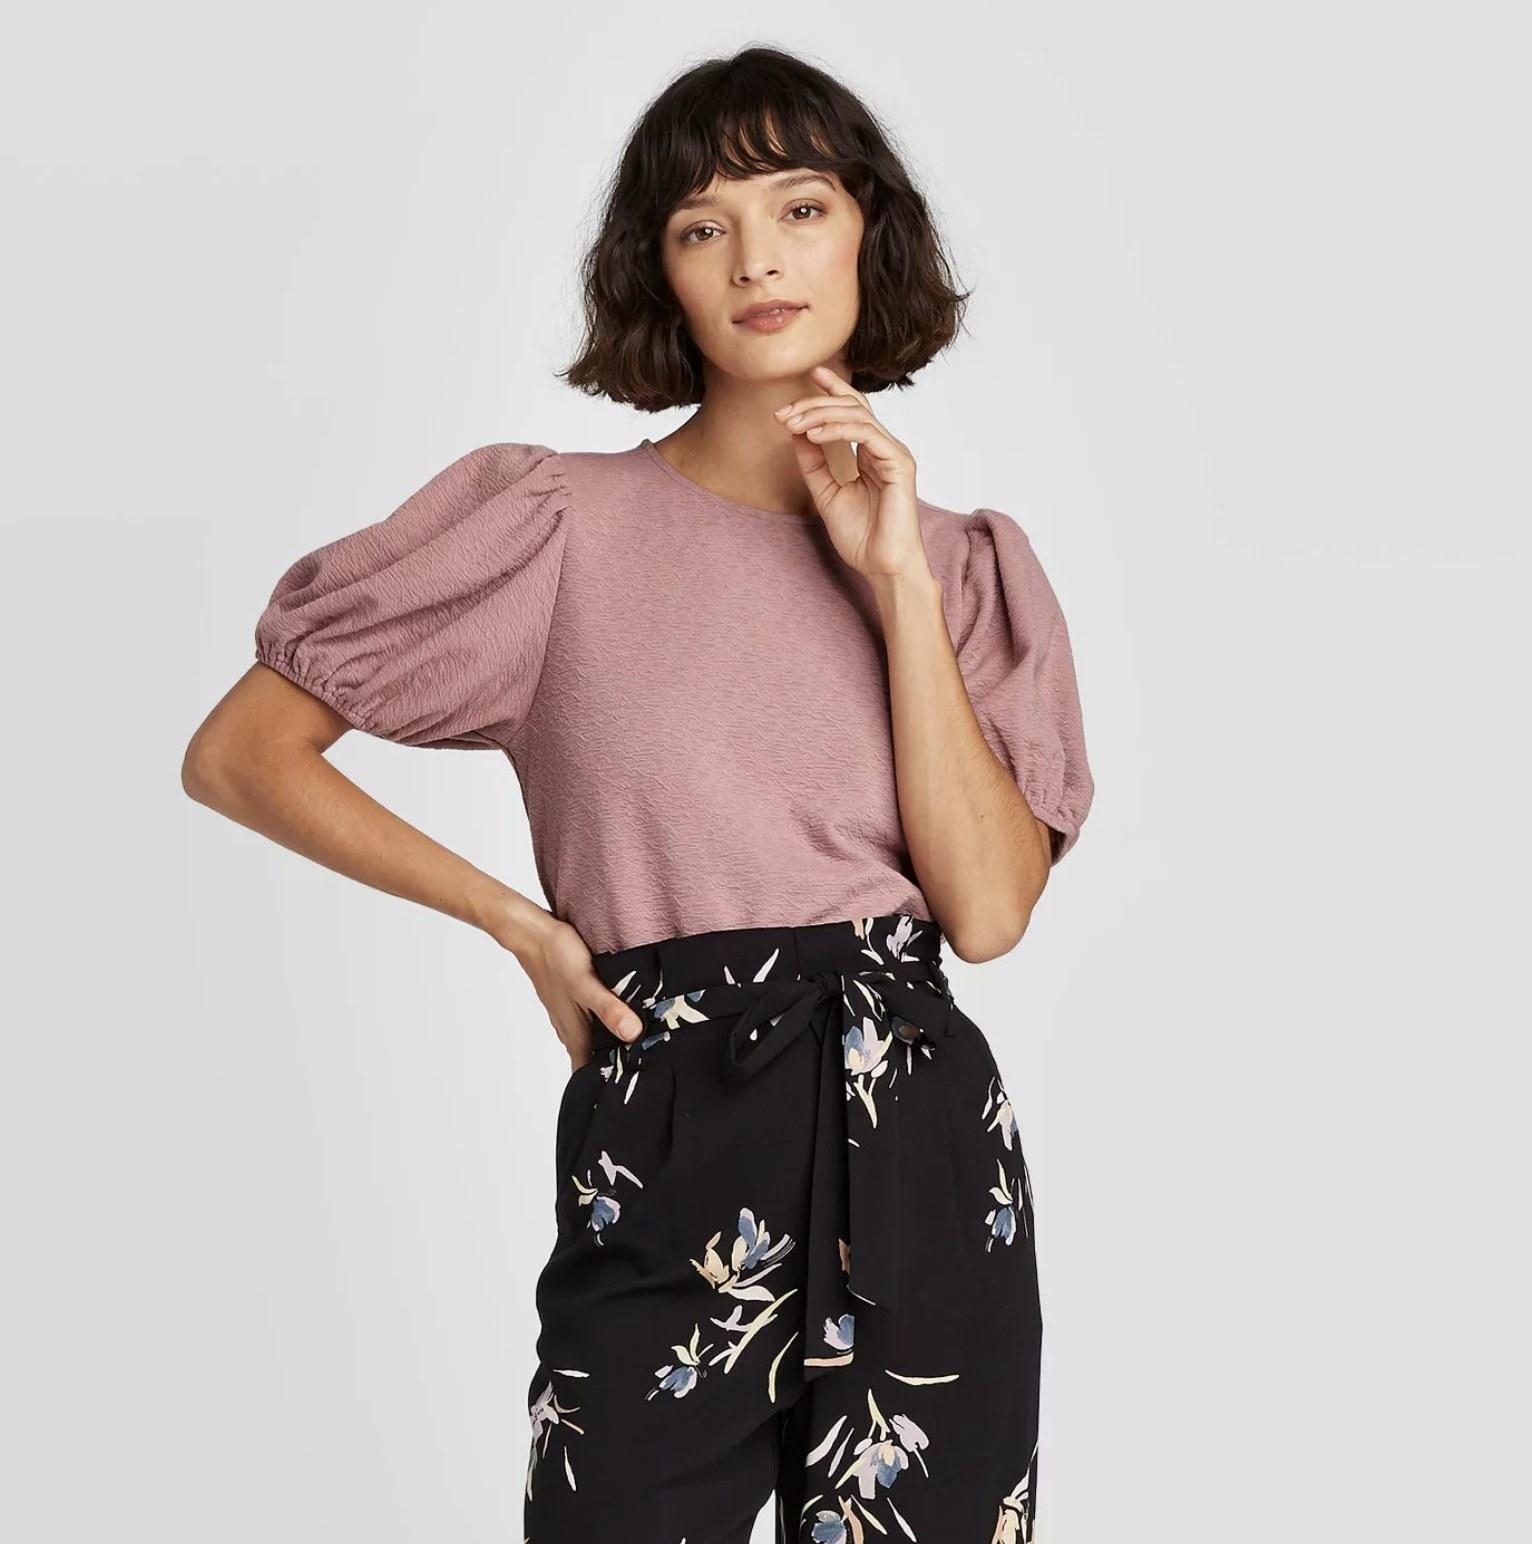 model wearing pink puff sleeve shirt